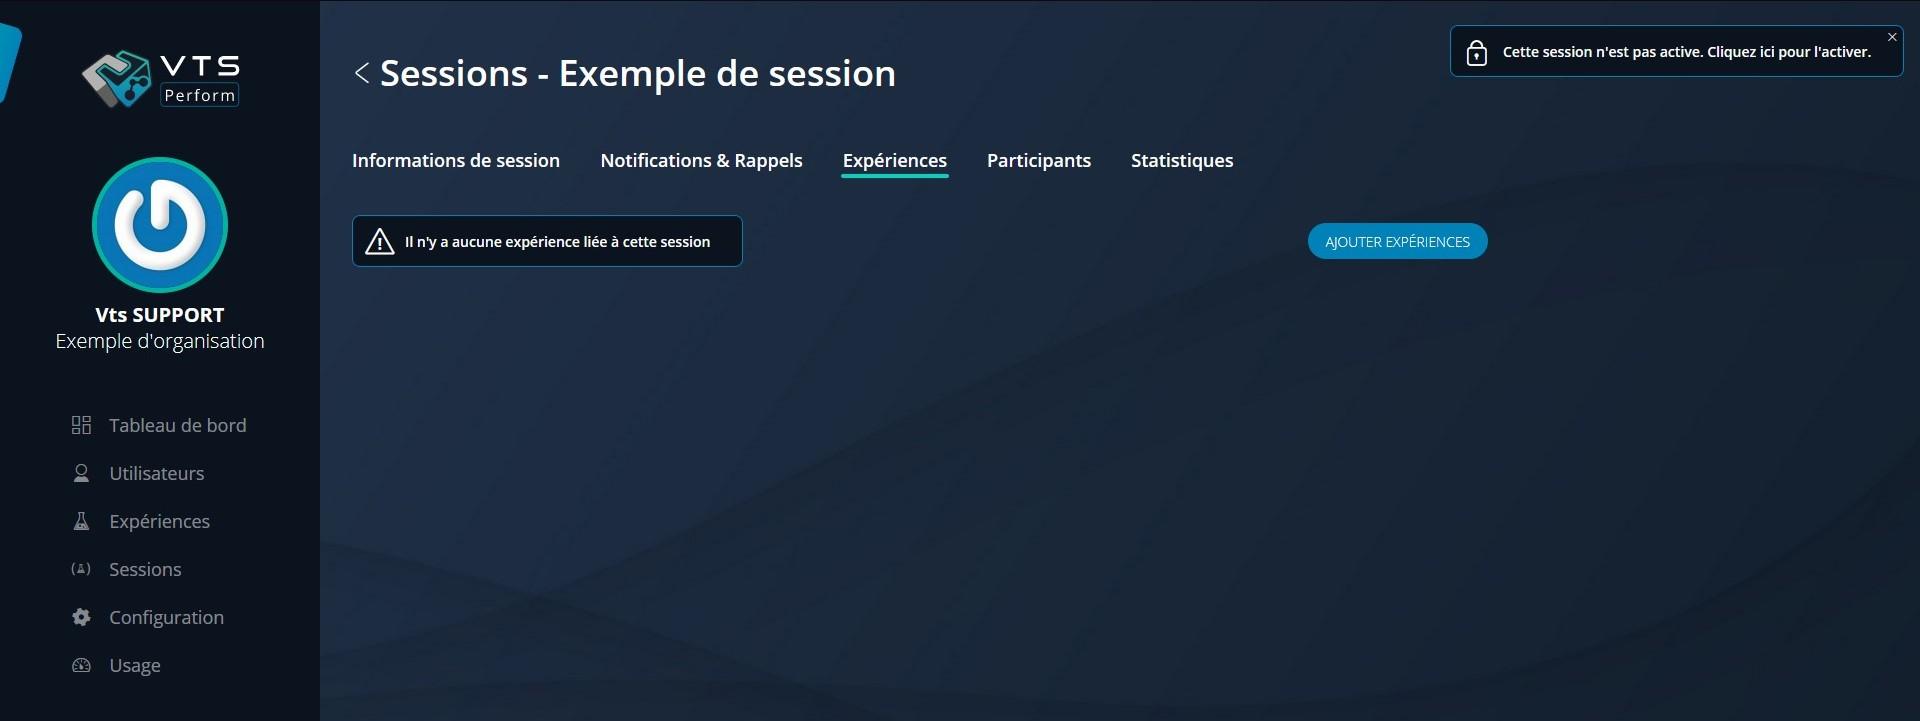 perform_sessionexperiences1_fr.jpg (115 KB)